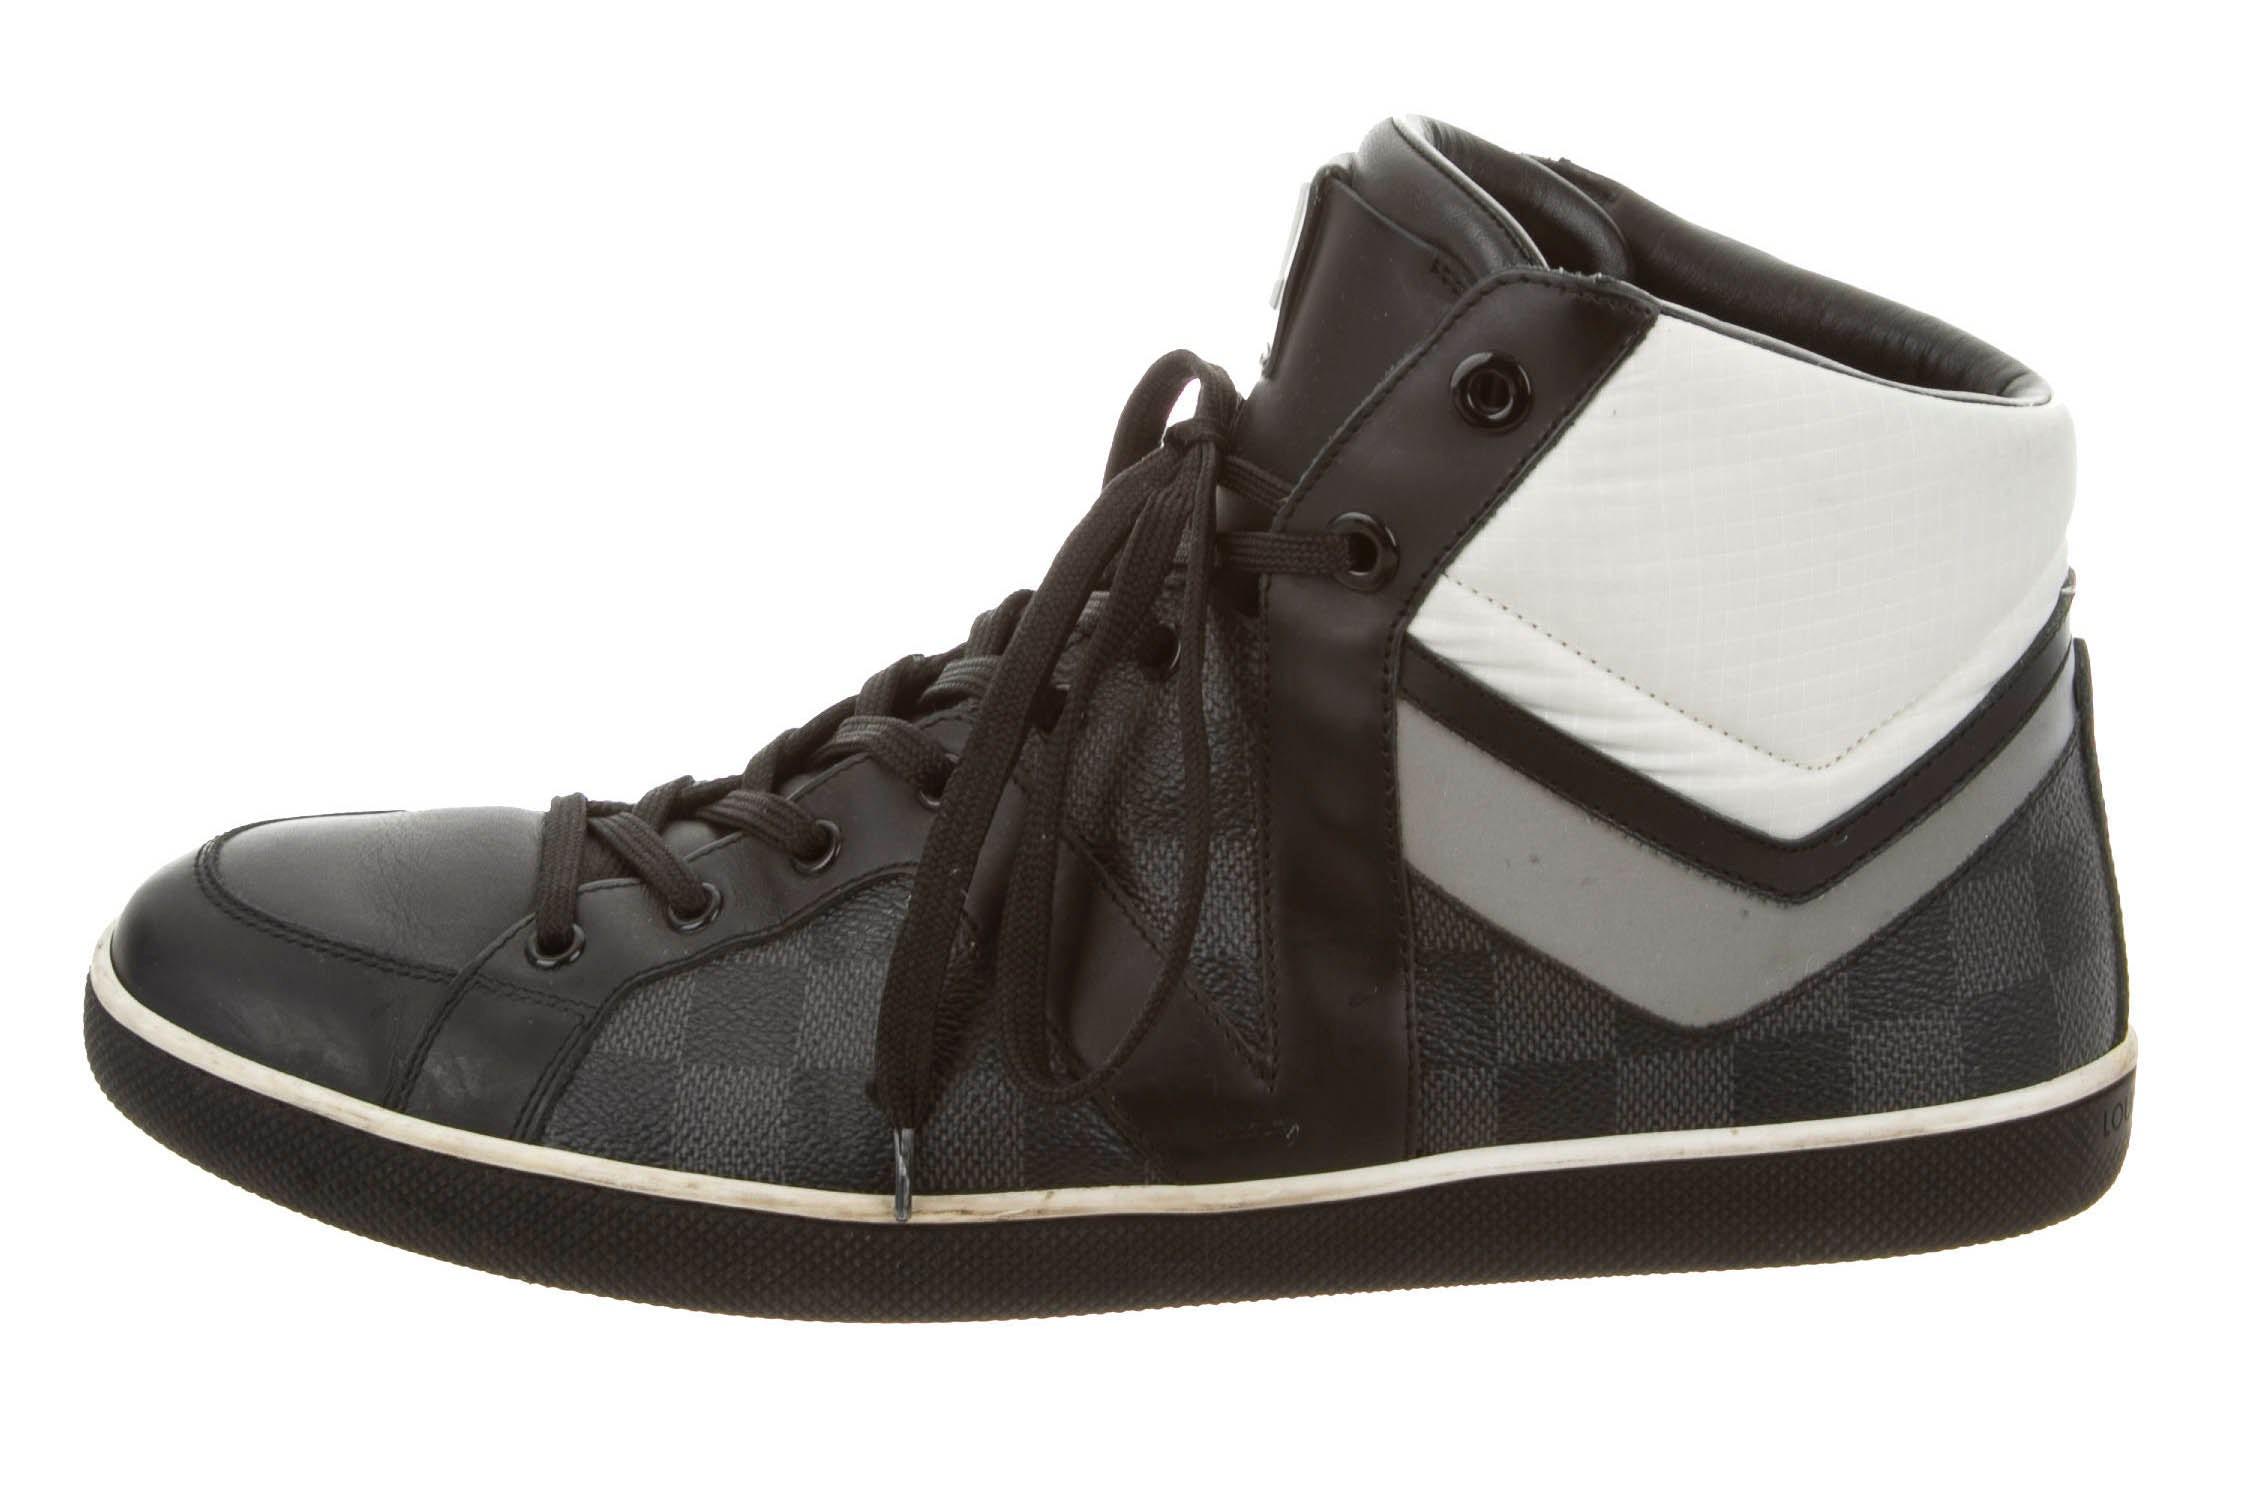 Louis Vuitton Sneaker Is Silicon Valley's Latest Status Symbol